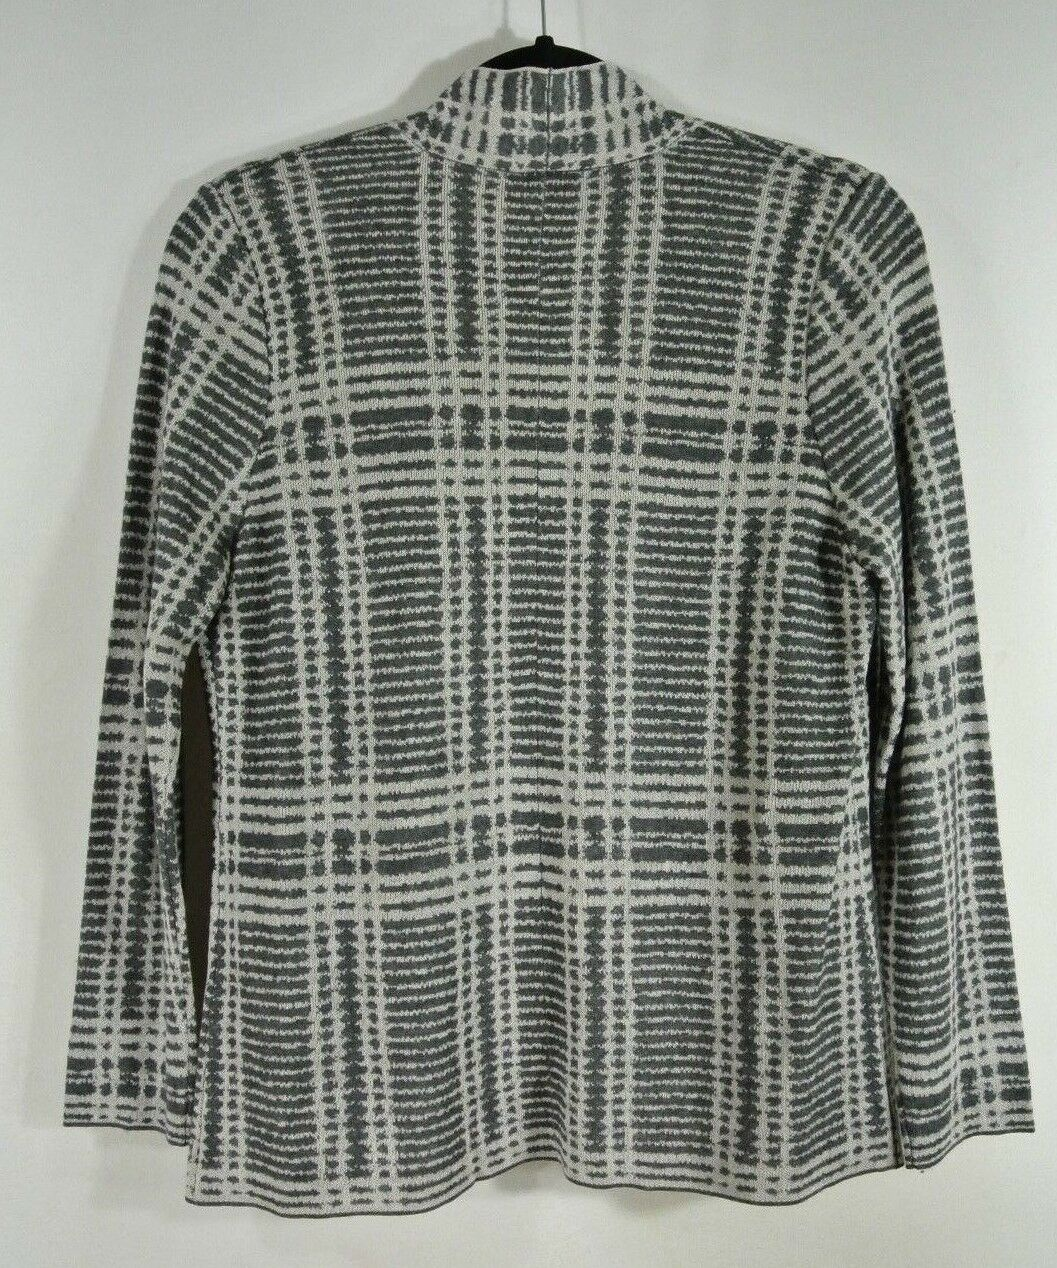 NEW Eileen Fisher Sleek Printed Tencel & Merino Shaped Cardigan, Cardigan, Cardigan, Charcoal - XL ca4c1c